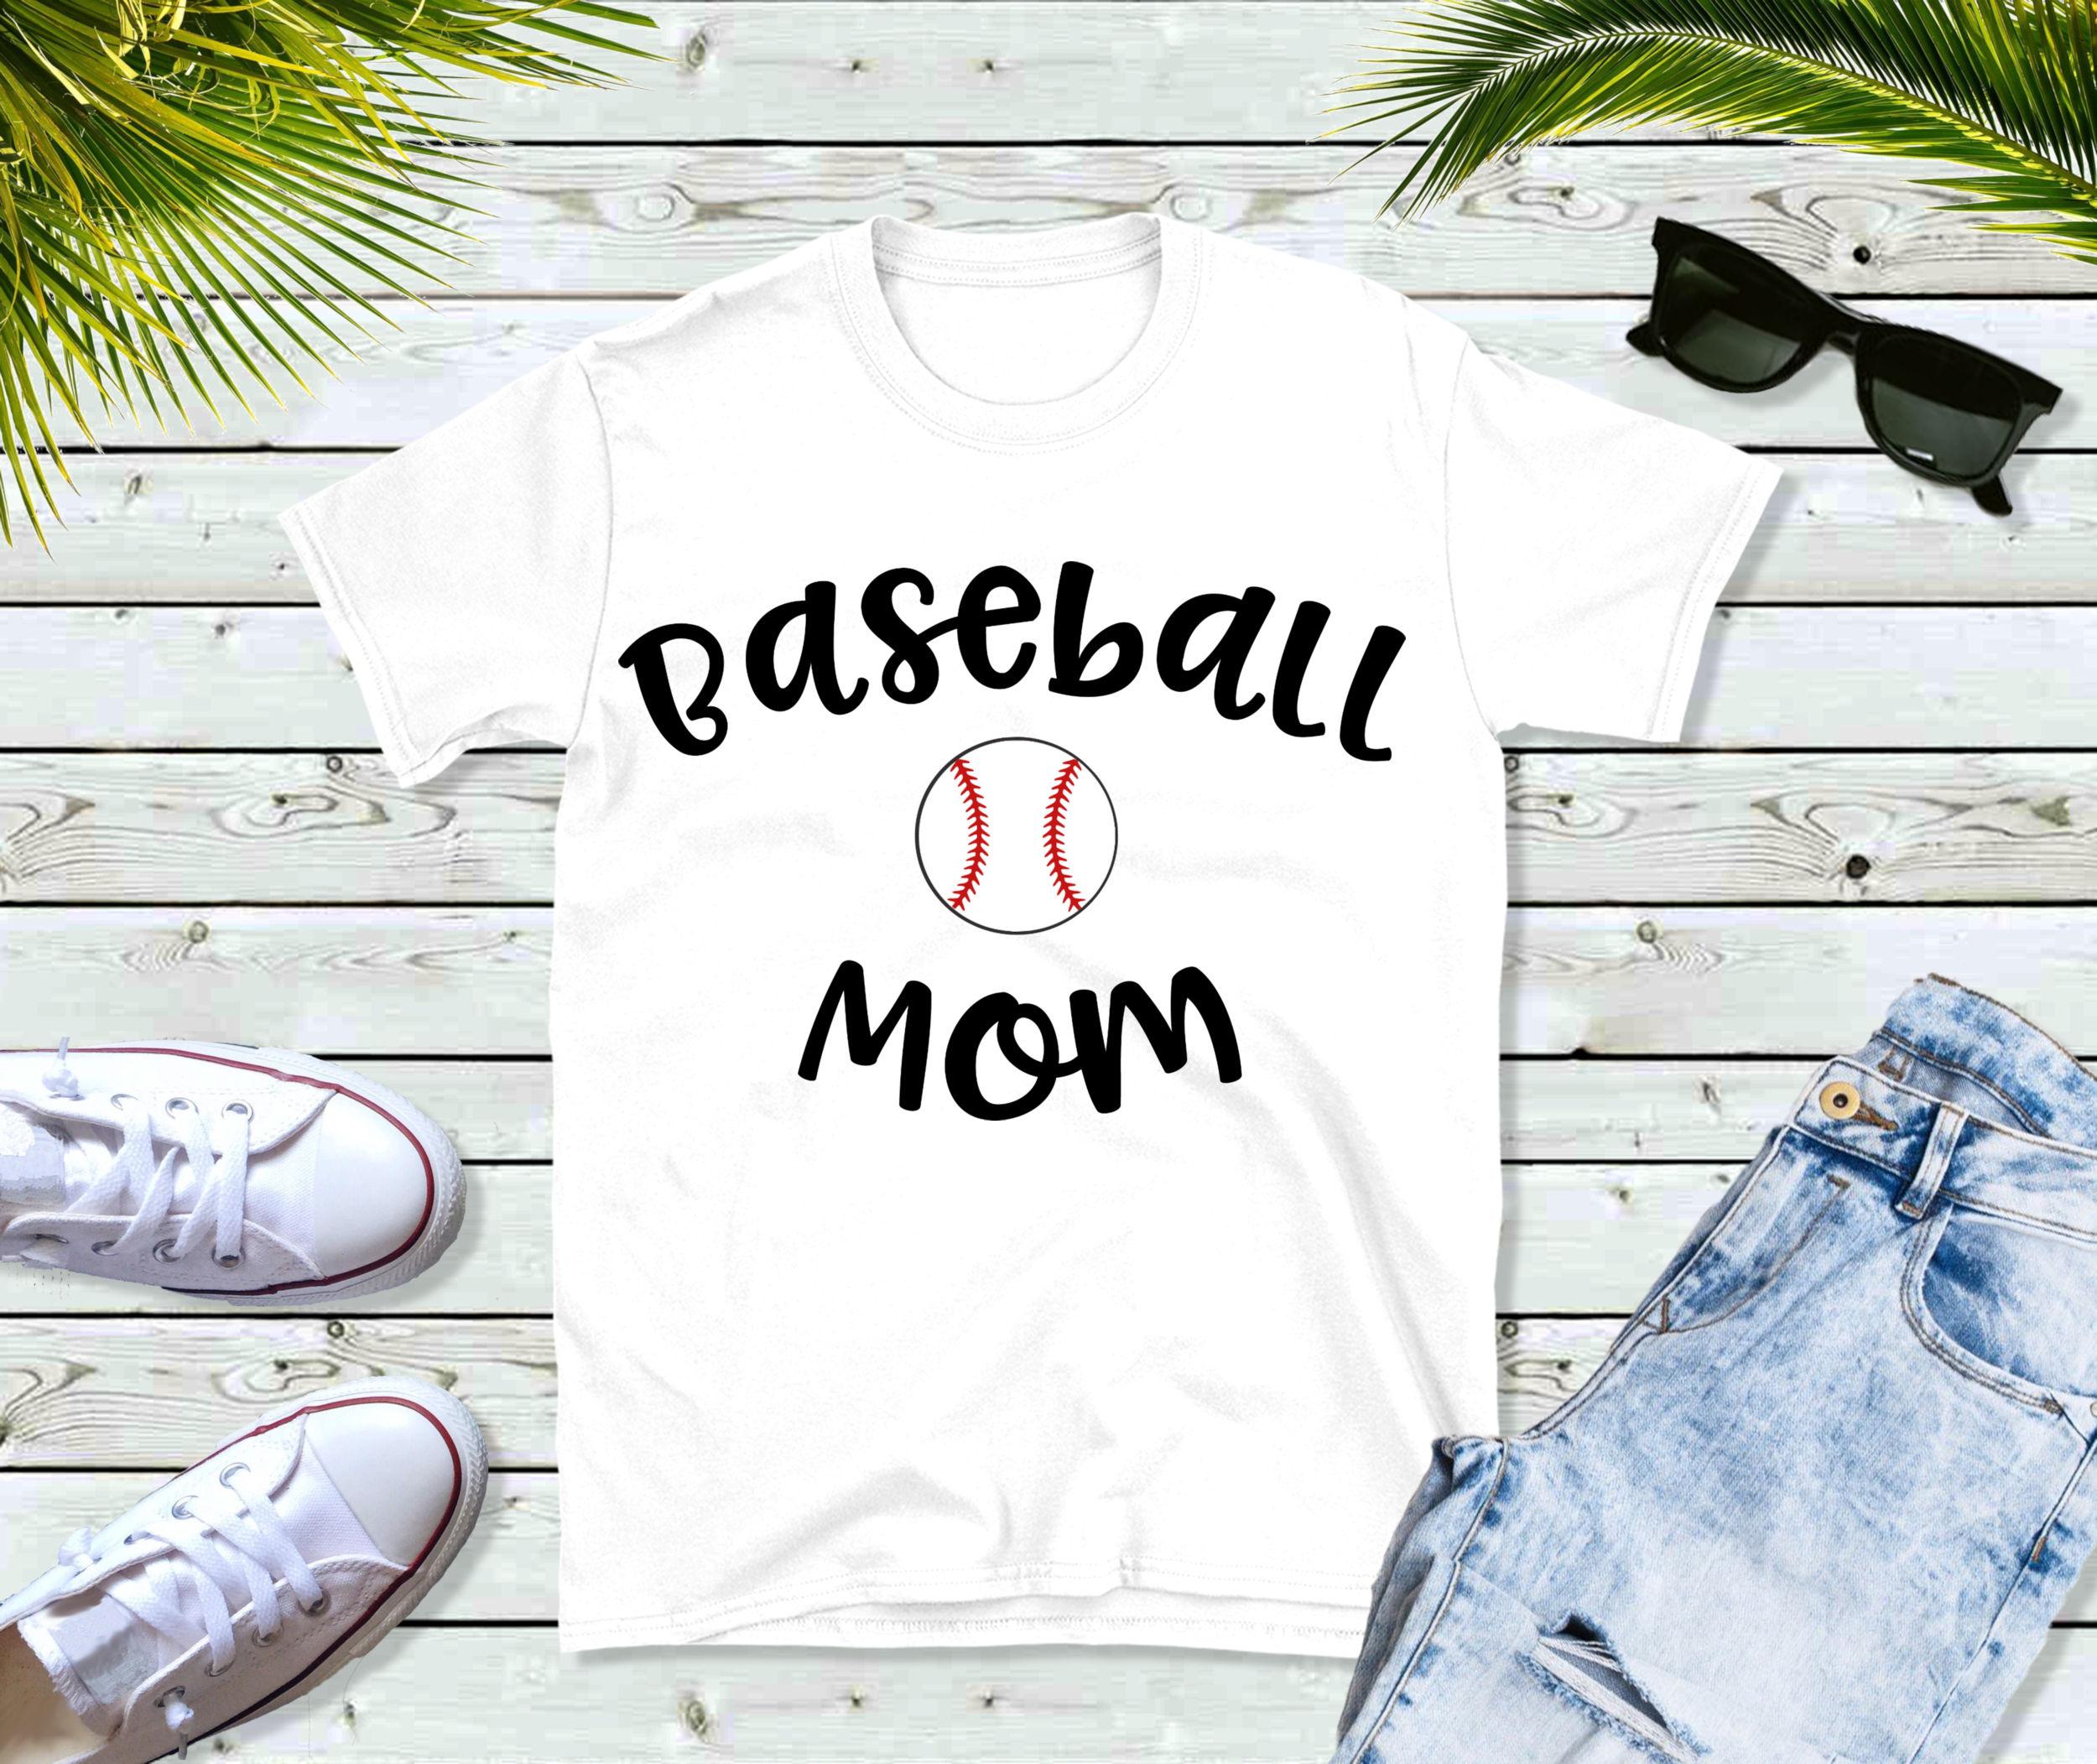 Baseball SVG Bundle - Includes 12 Baseball Designs example image 10